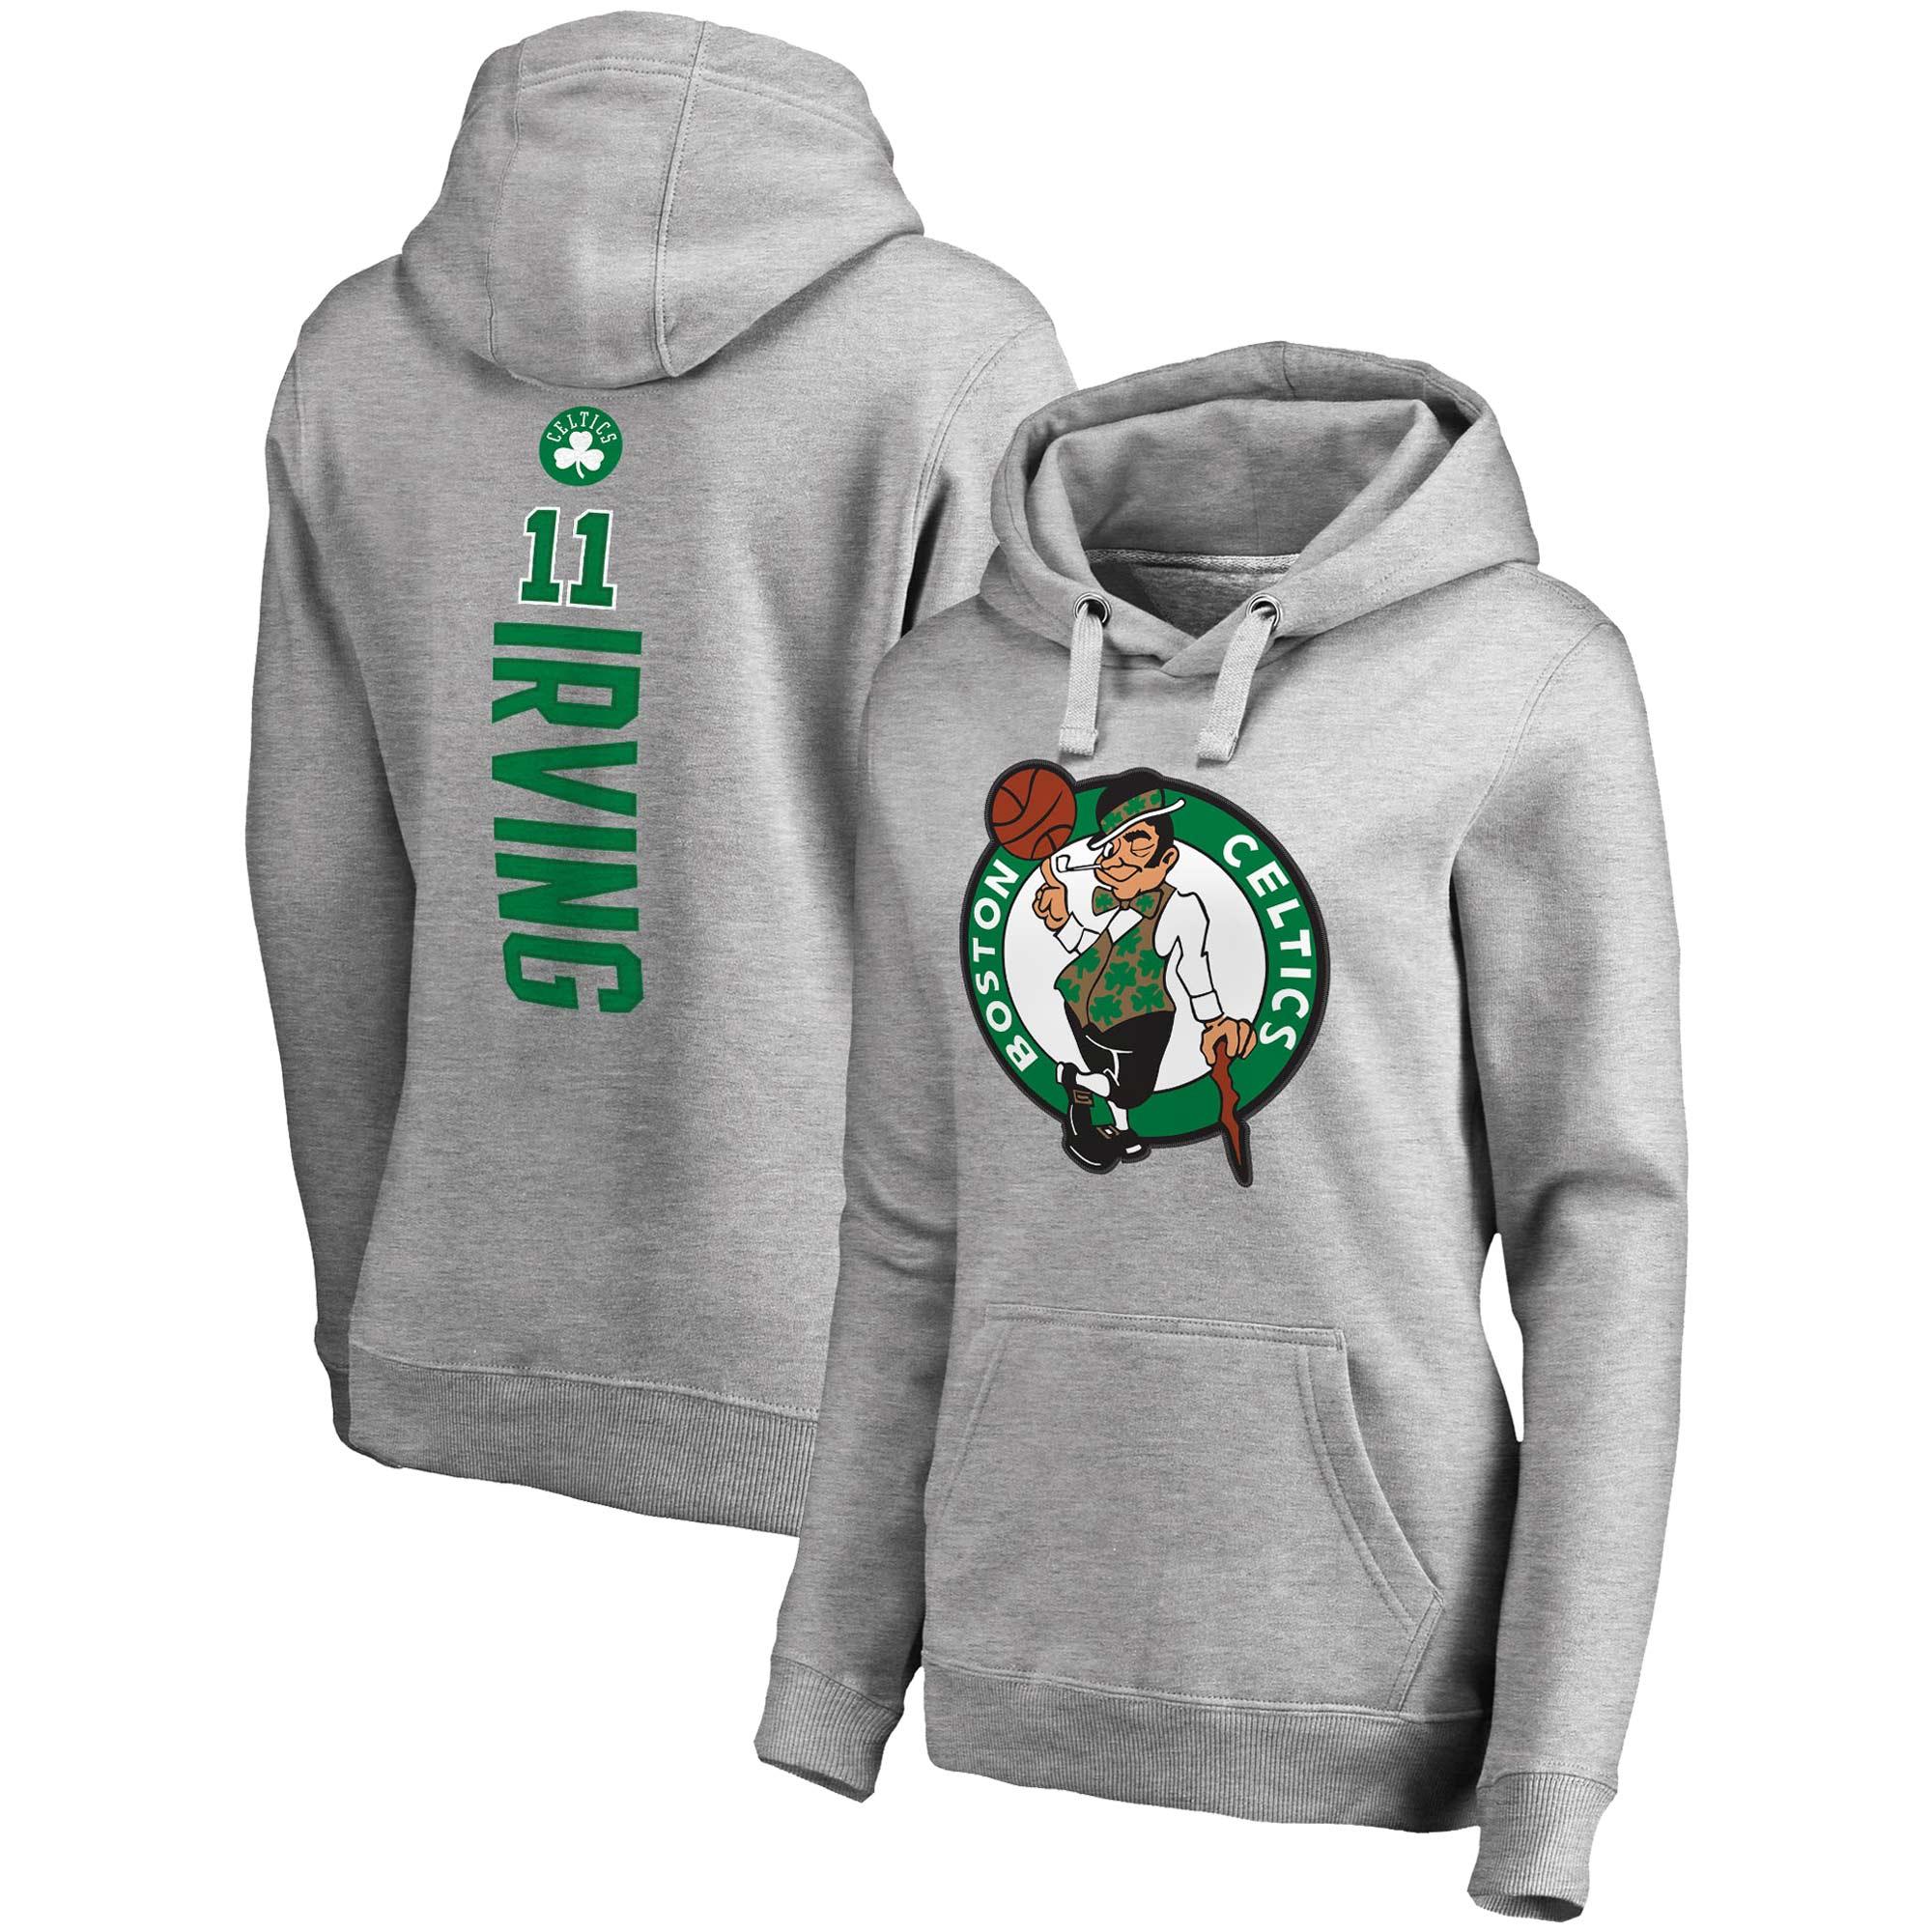 Kyrie Irving Boston Celtics Fanatics Branded Women's Backer Name & Number Pullover Hoodie - Gray